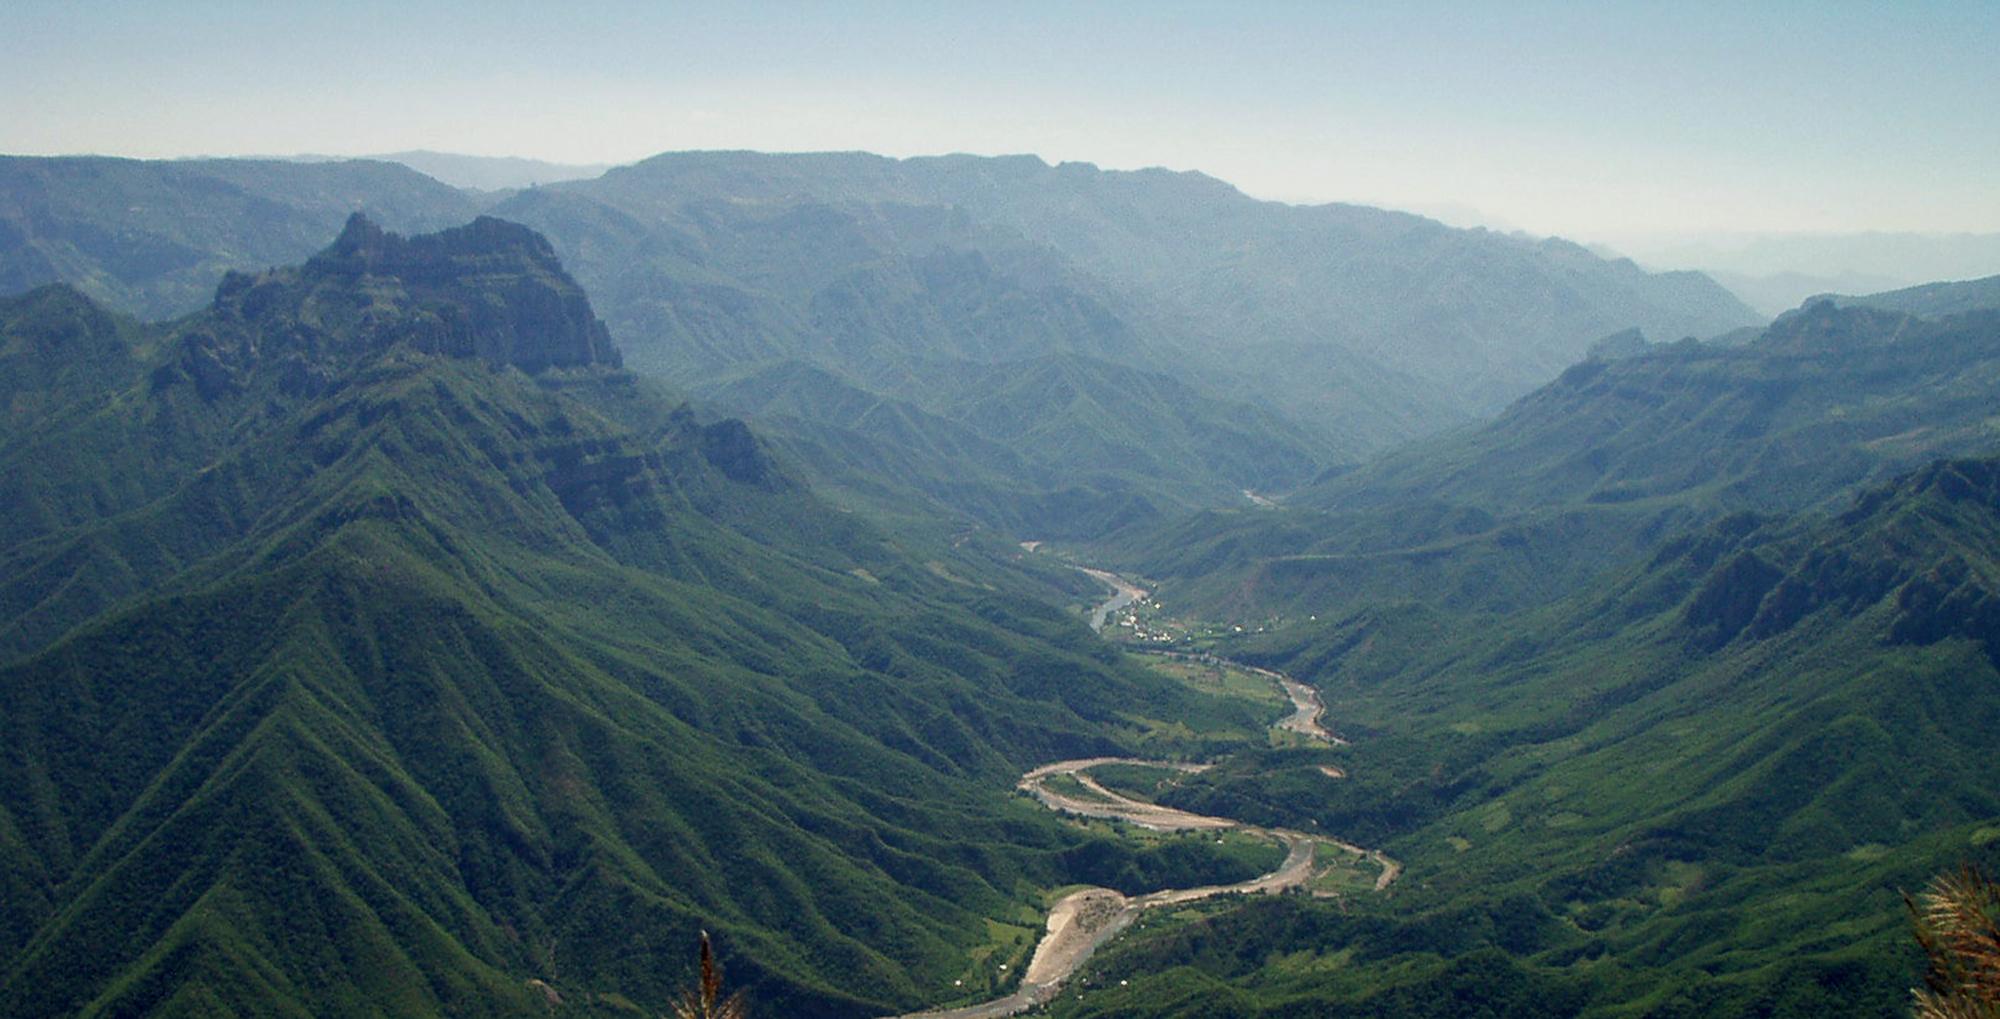 The overlook at Cerro Gallegos